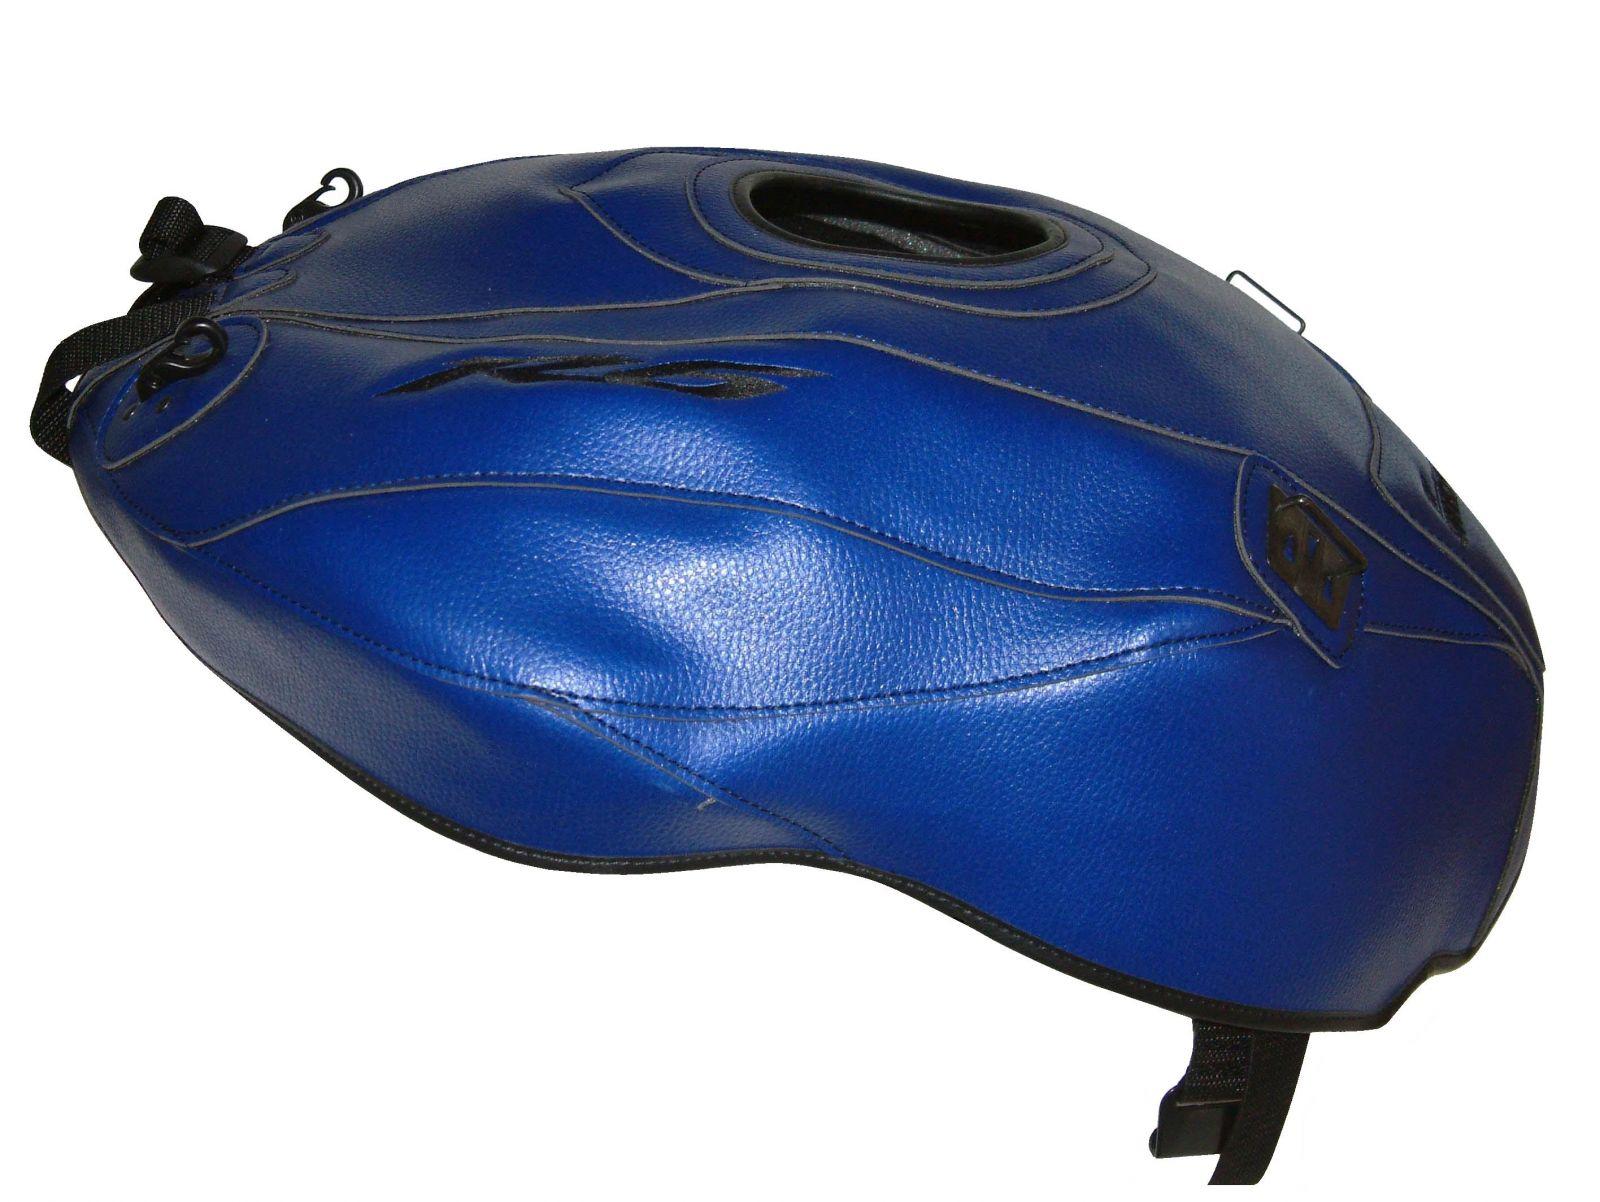 Tapis protège-réservoir TPR4406 - YAMAHA YZF R6 [2006-2007]